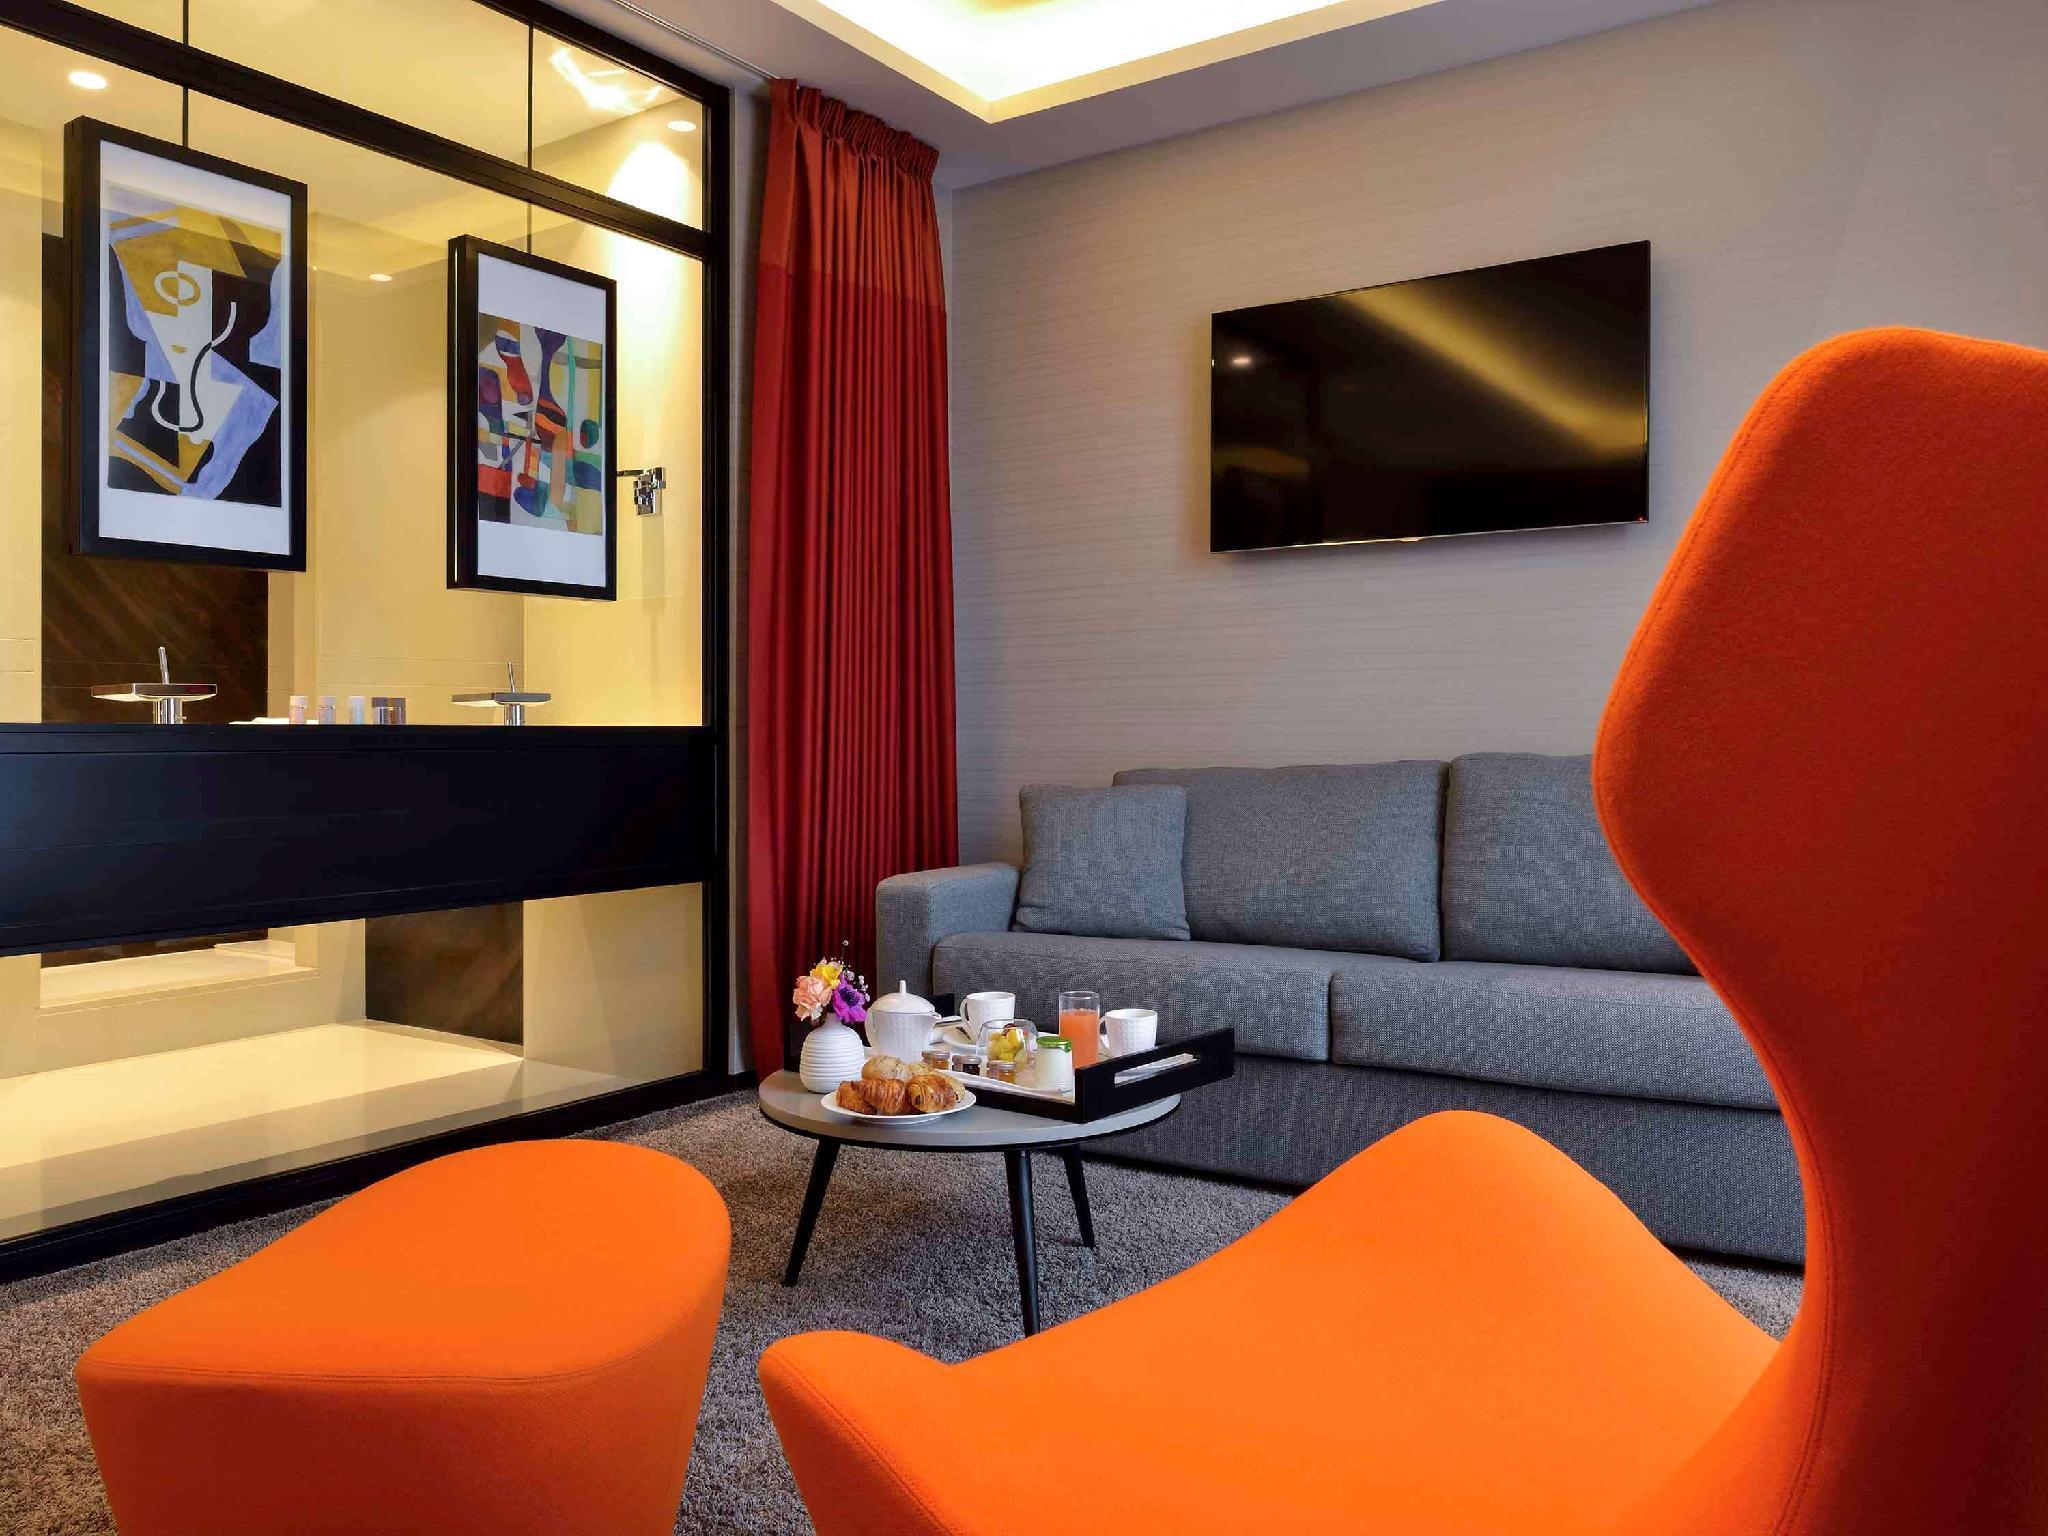 Grand Hotel La Cloche Dijon Mgallery In France Room Deals Photos Reviews